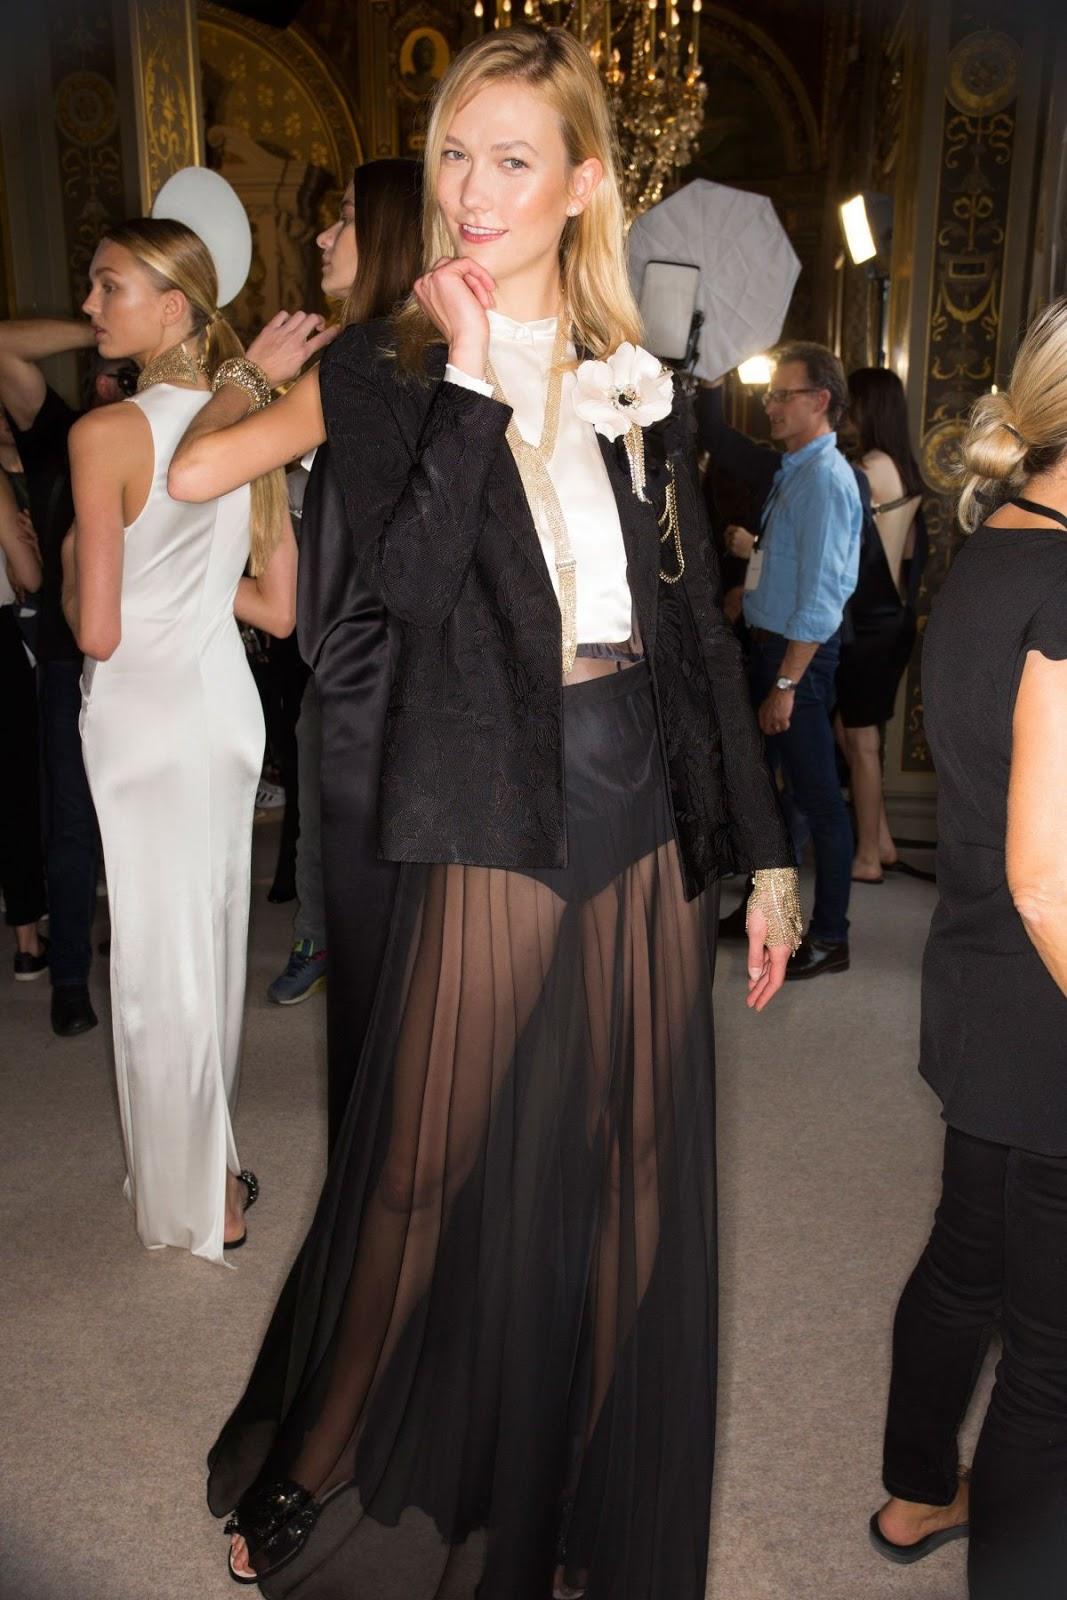 Karlie Kloss at Lanvin Spring/Summer 2017 Fashion Show